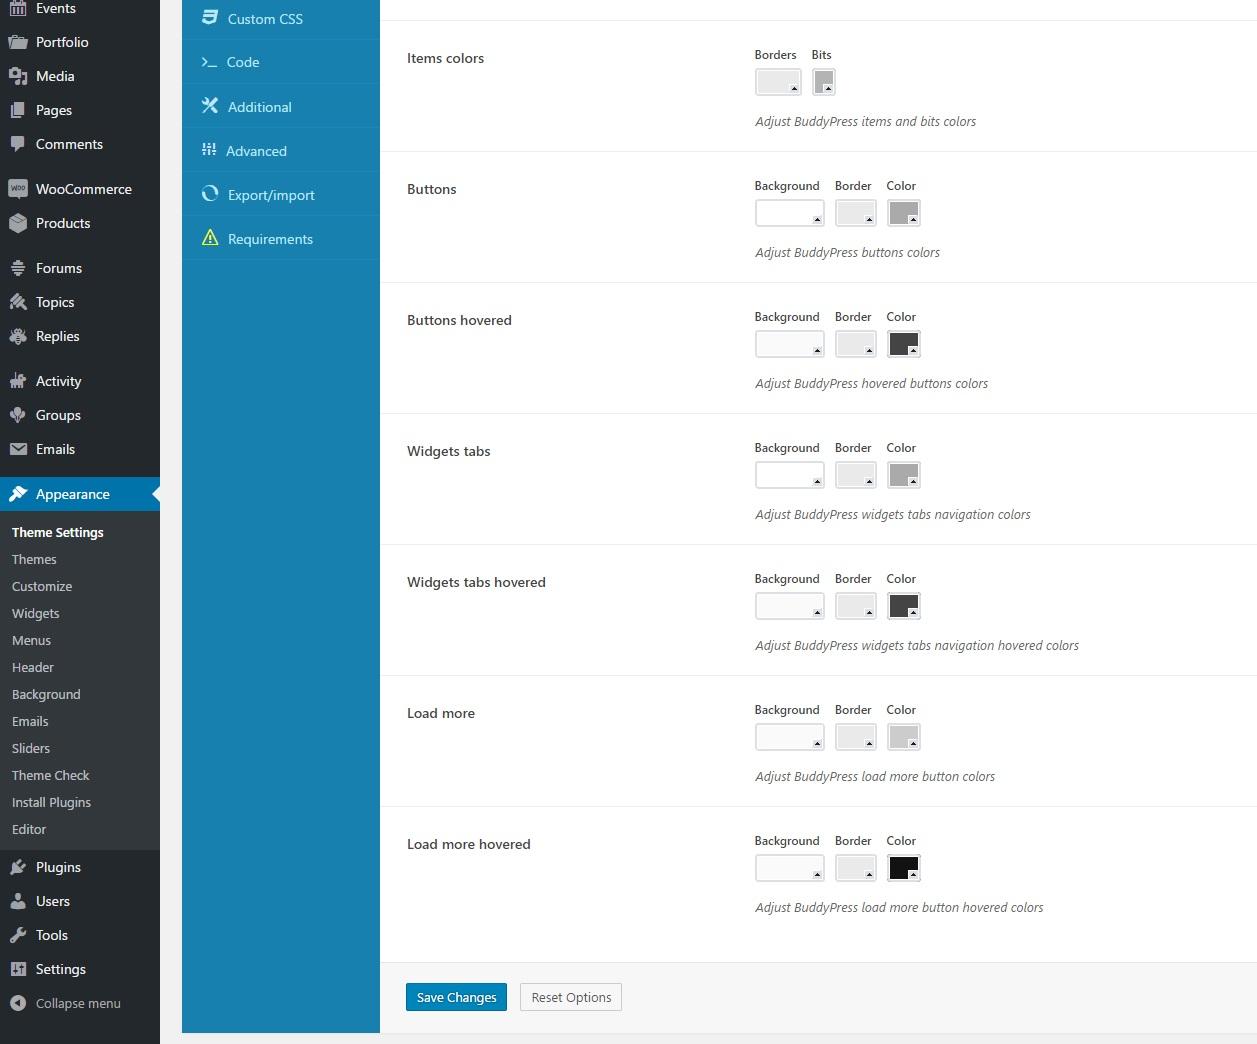 bb & BuddyPress options | Themezly™